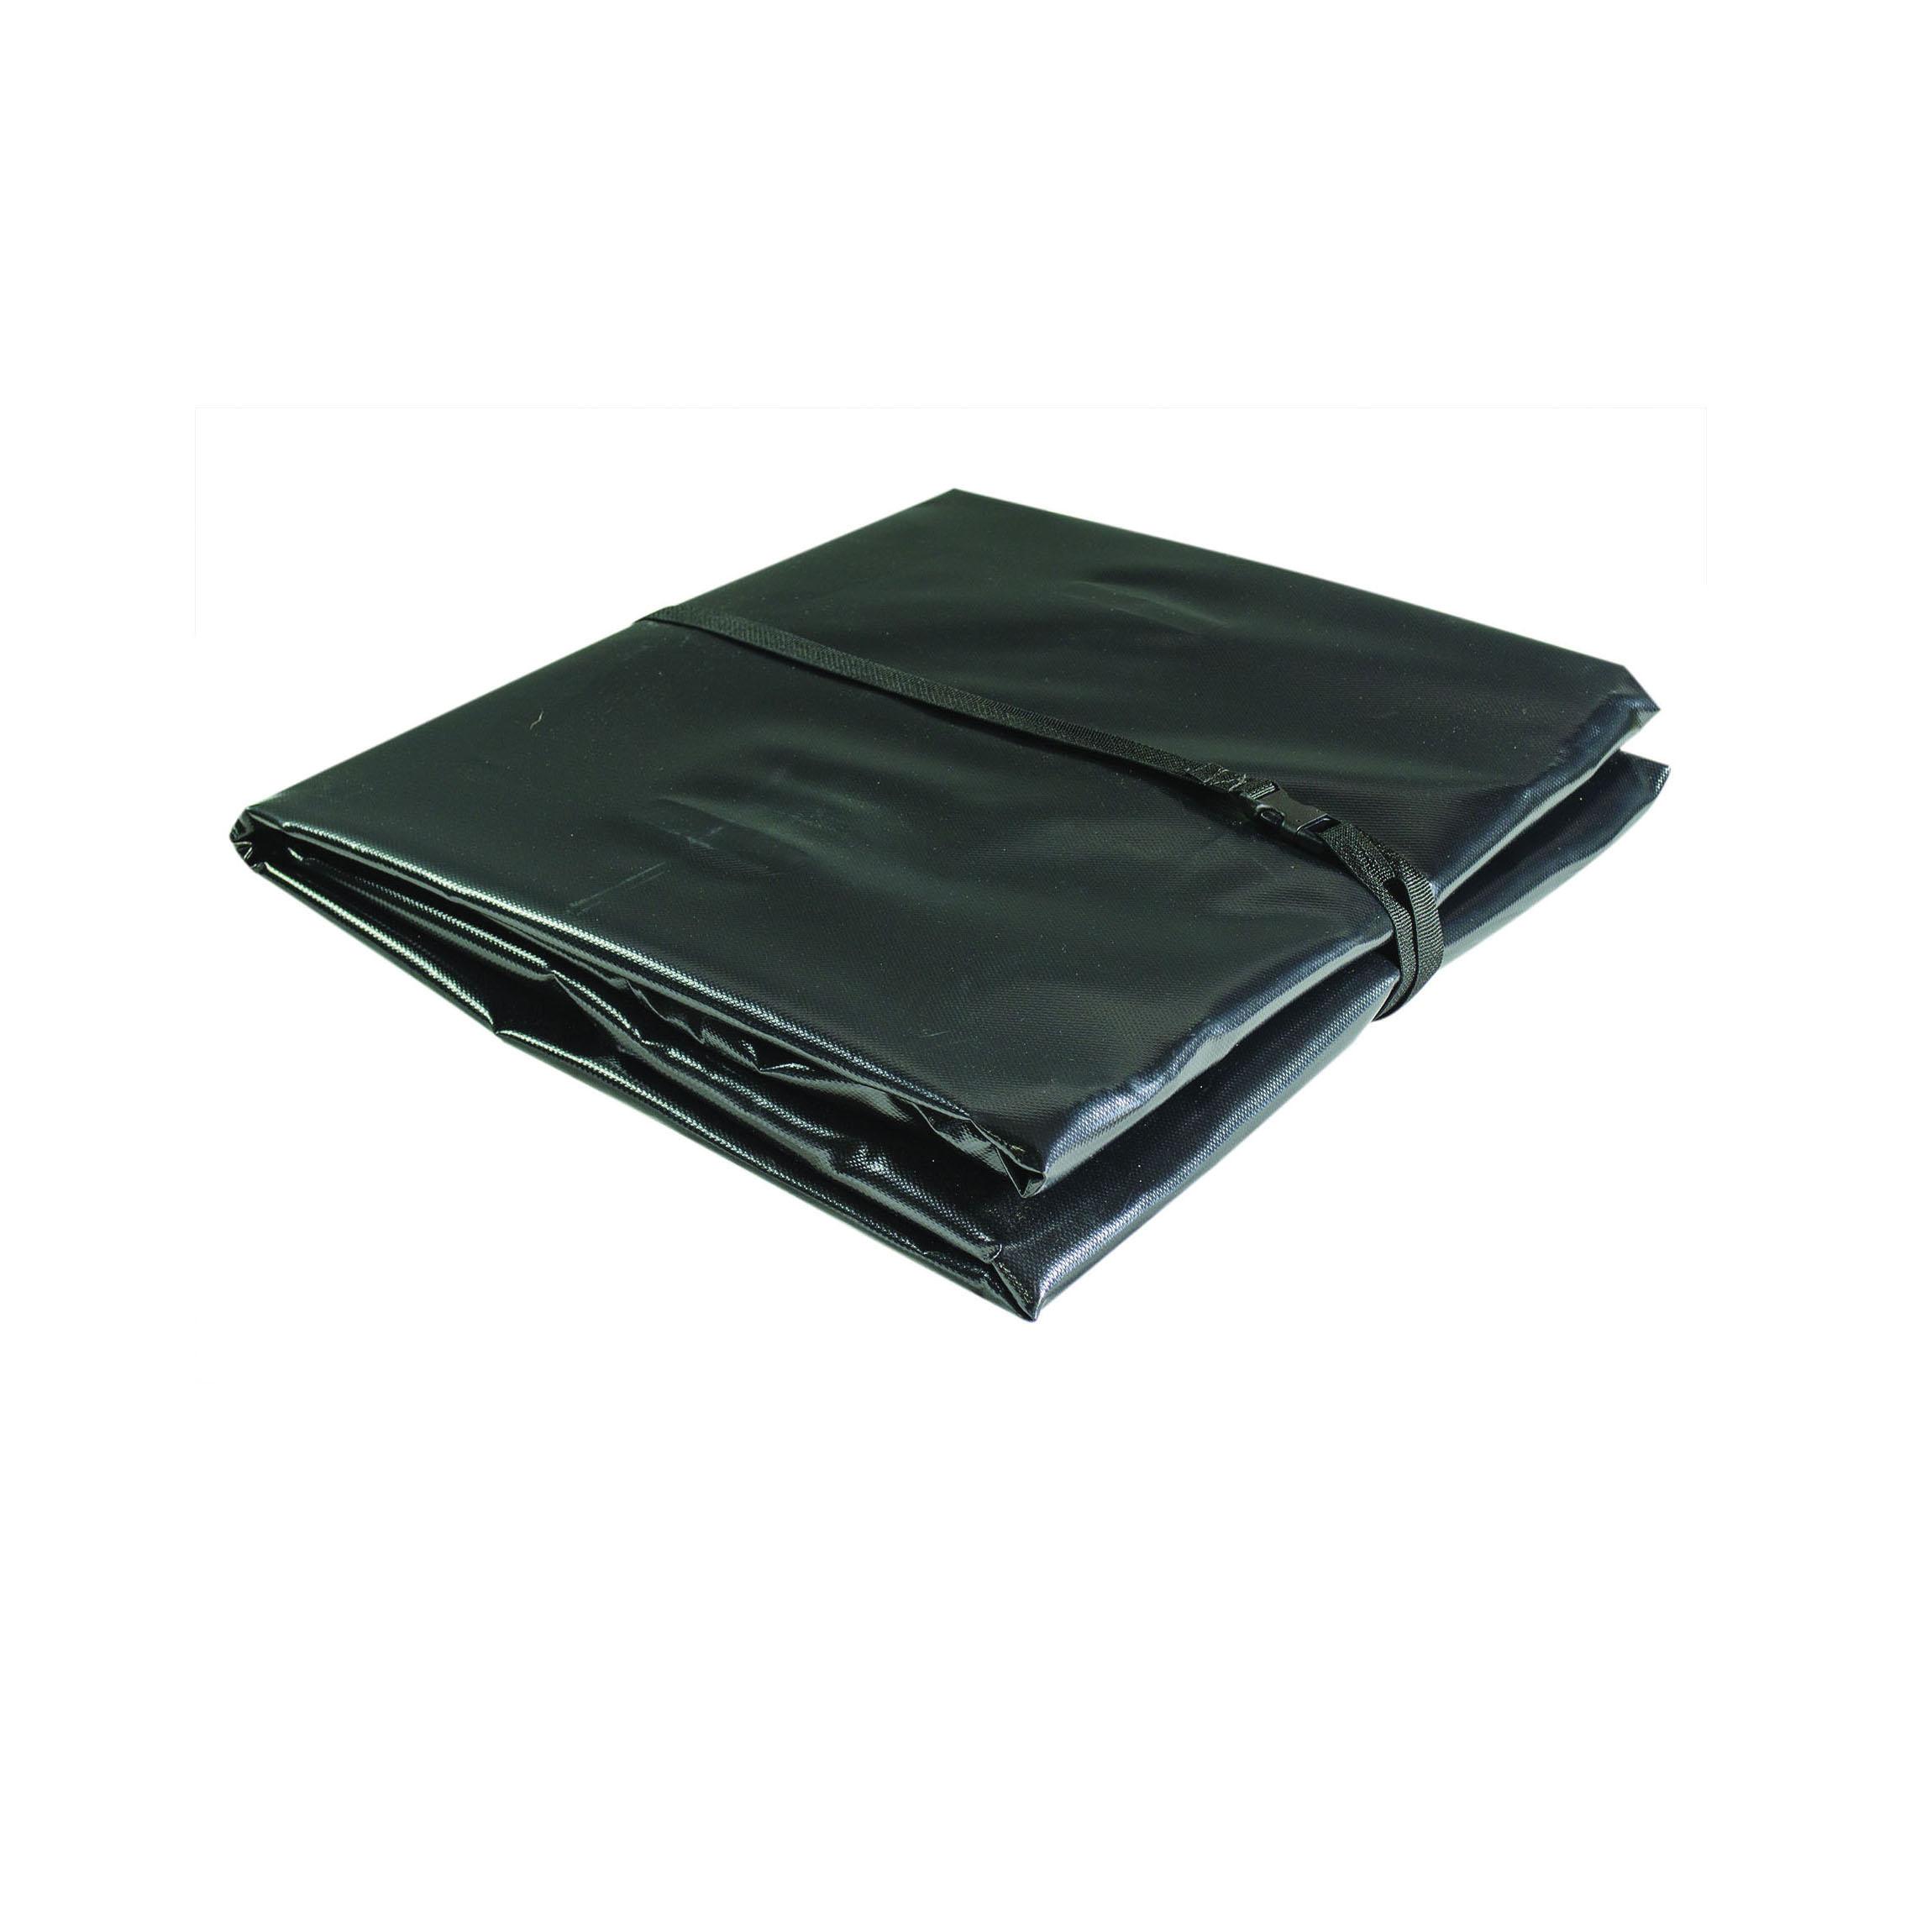 Justrite® 28432 Waterproof Tarp, 5 ft L x 5 ft W Finished, Black, PVC Coated Fabric